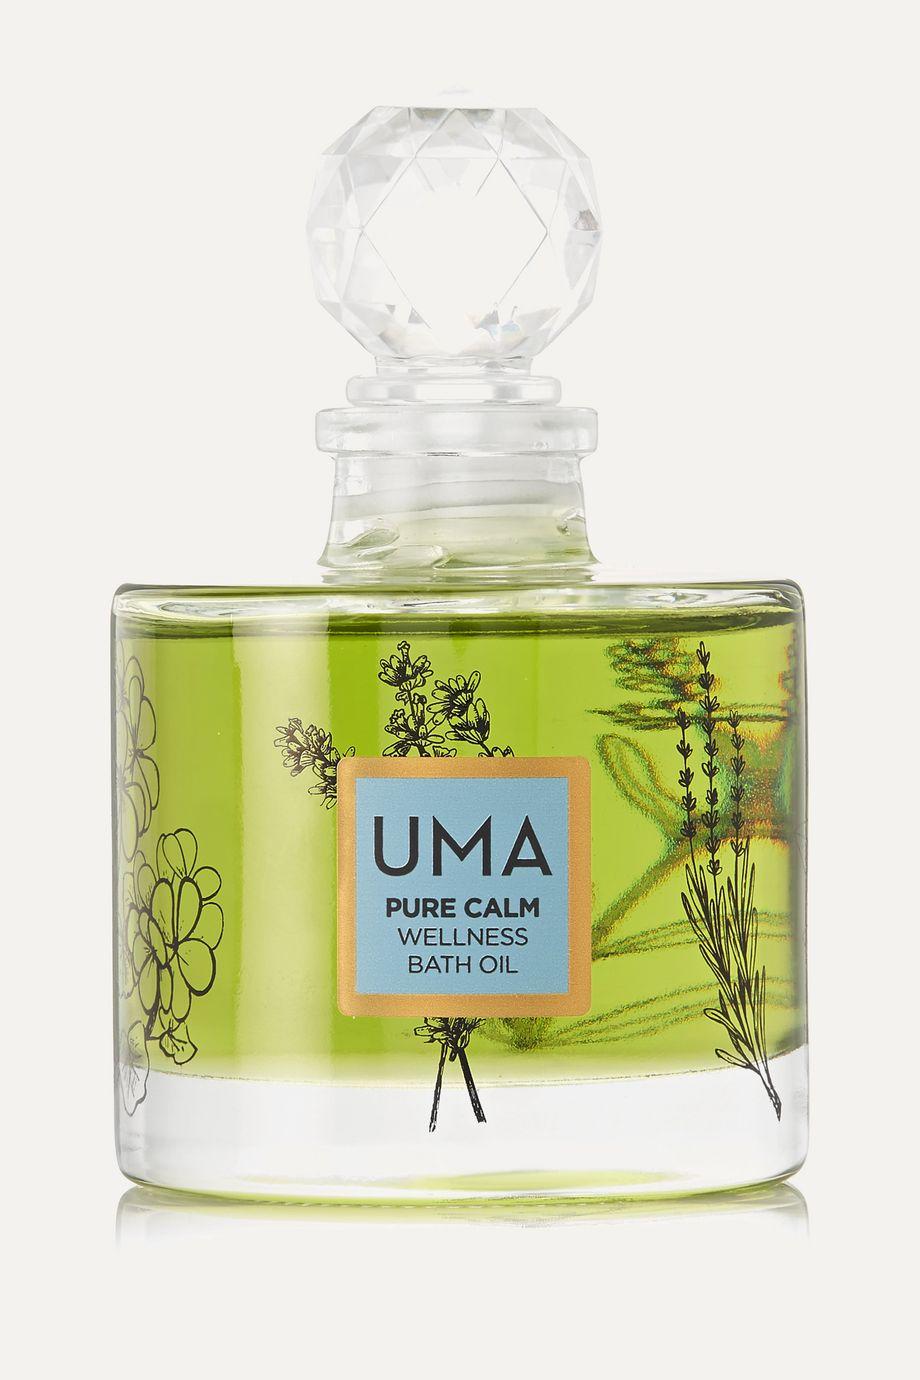 Uma Oils Pure Calm Bath Oil